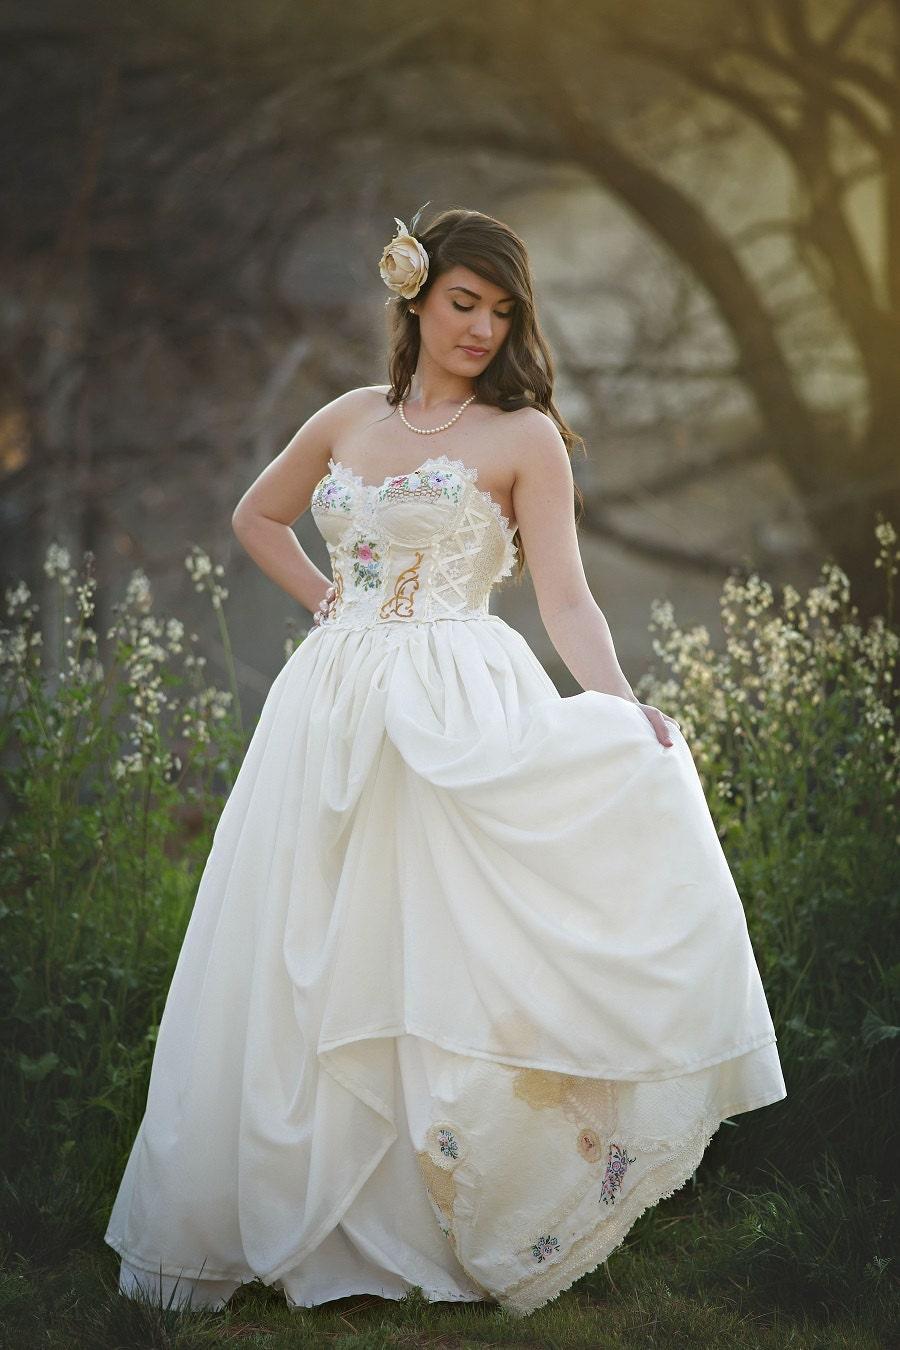 Storybook Romance Wedding Dress Unique Upcycled Vintage